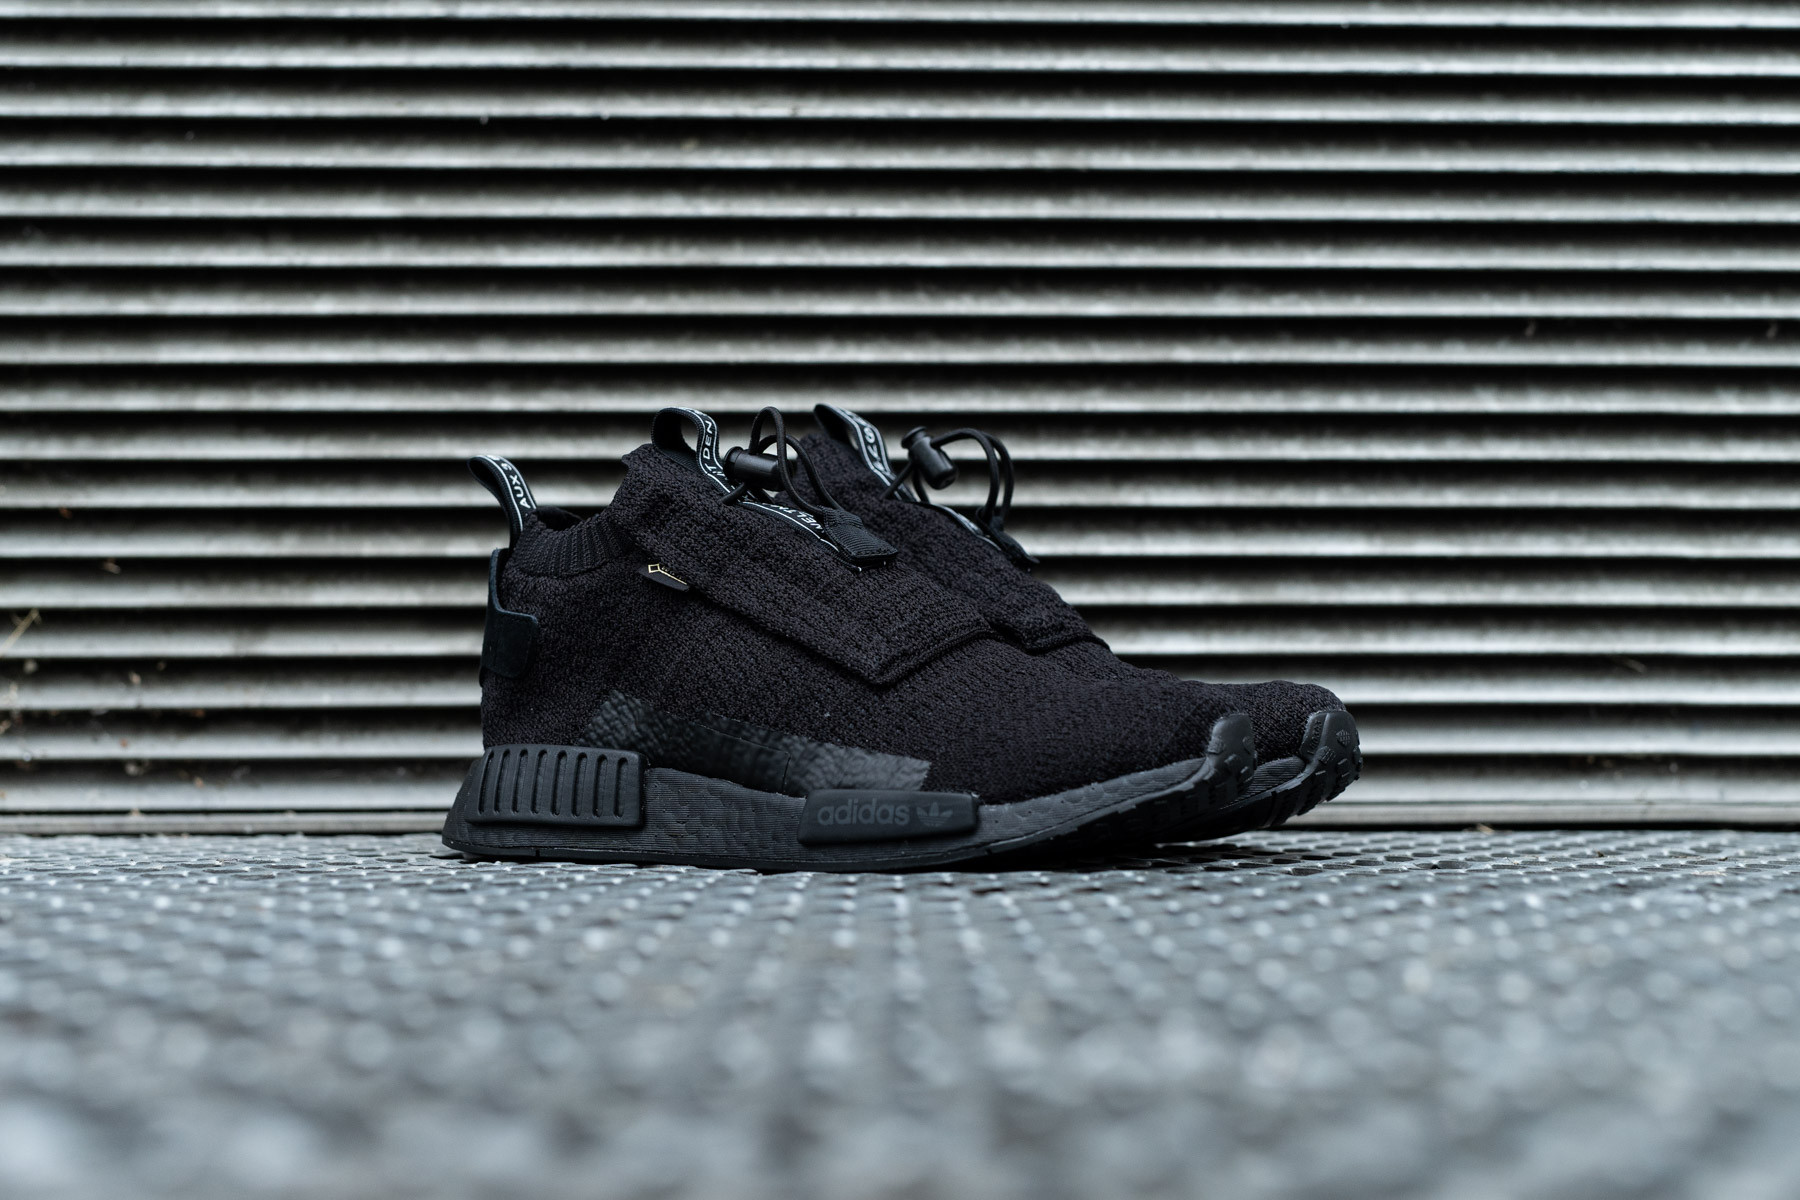 Adidas NMD_TS1 PK GTX Sneaker.no